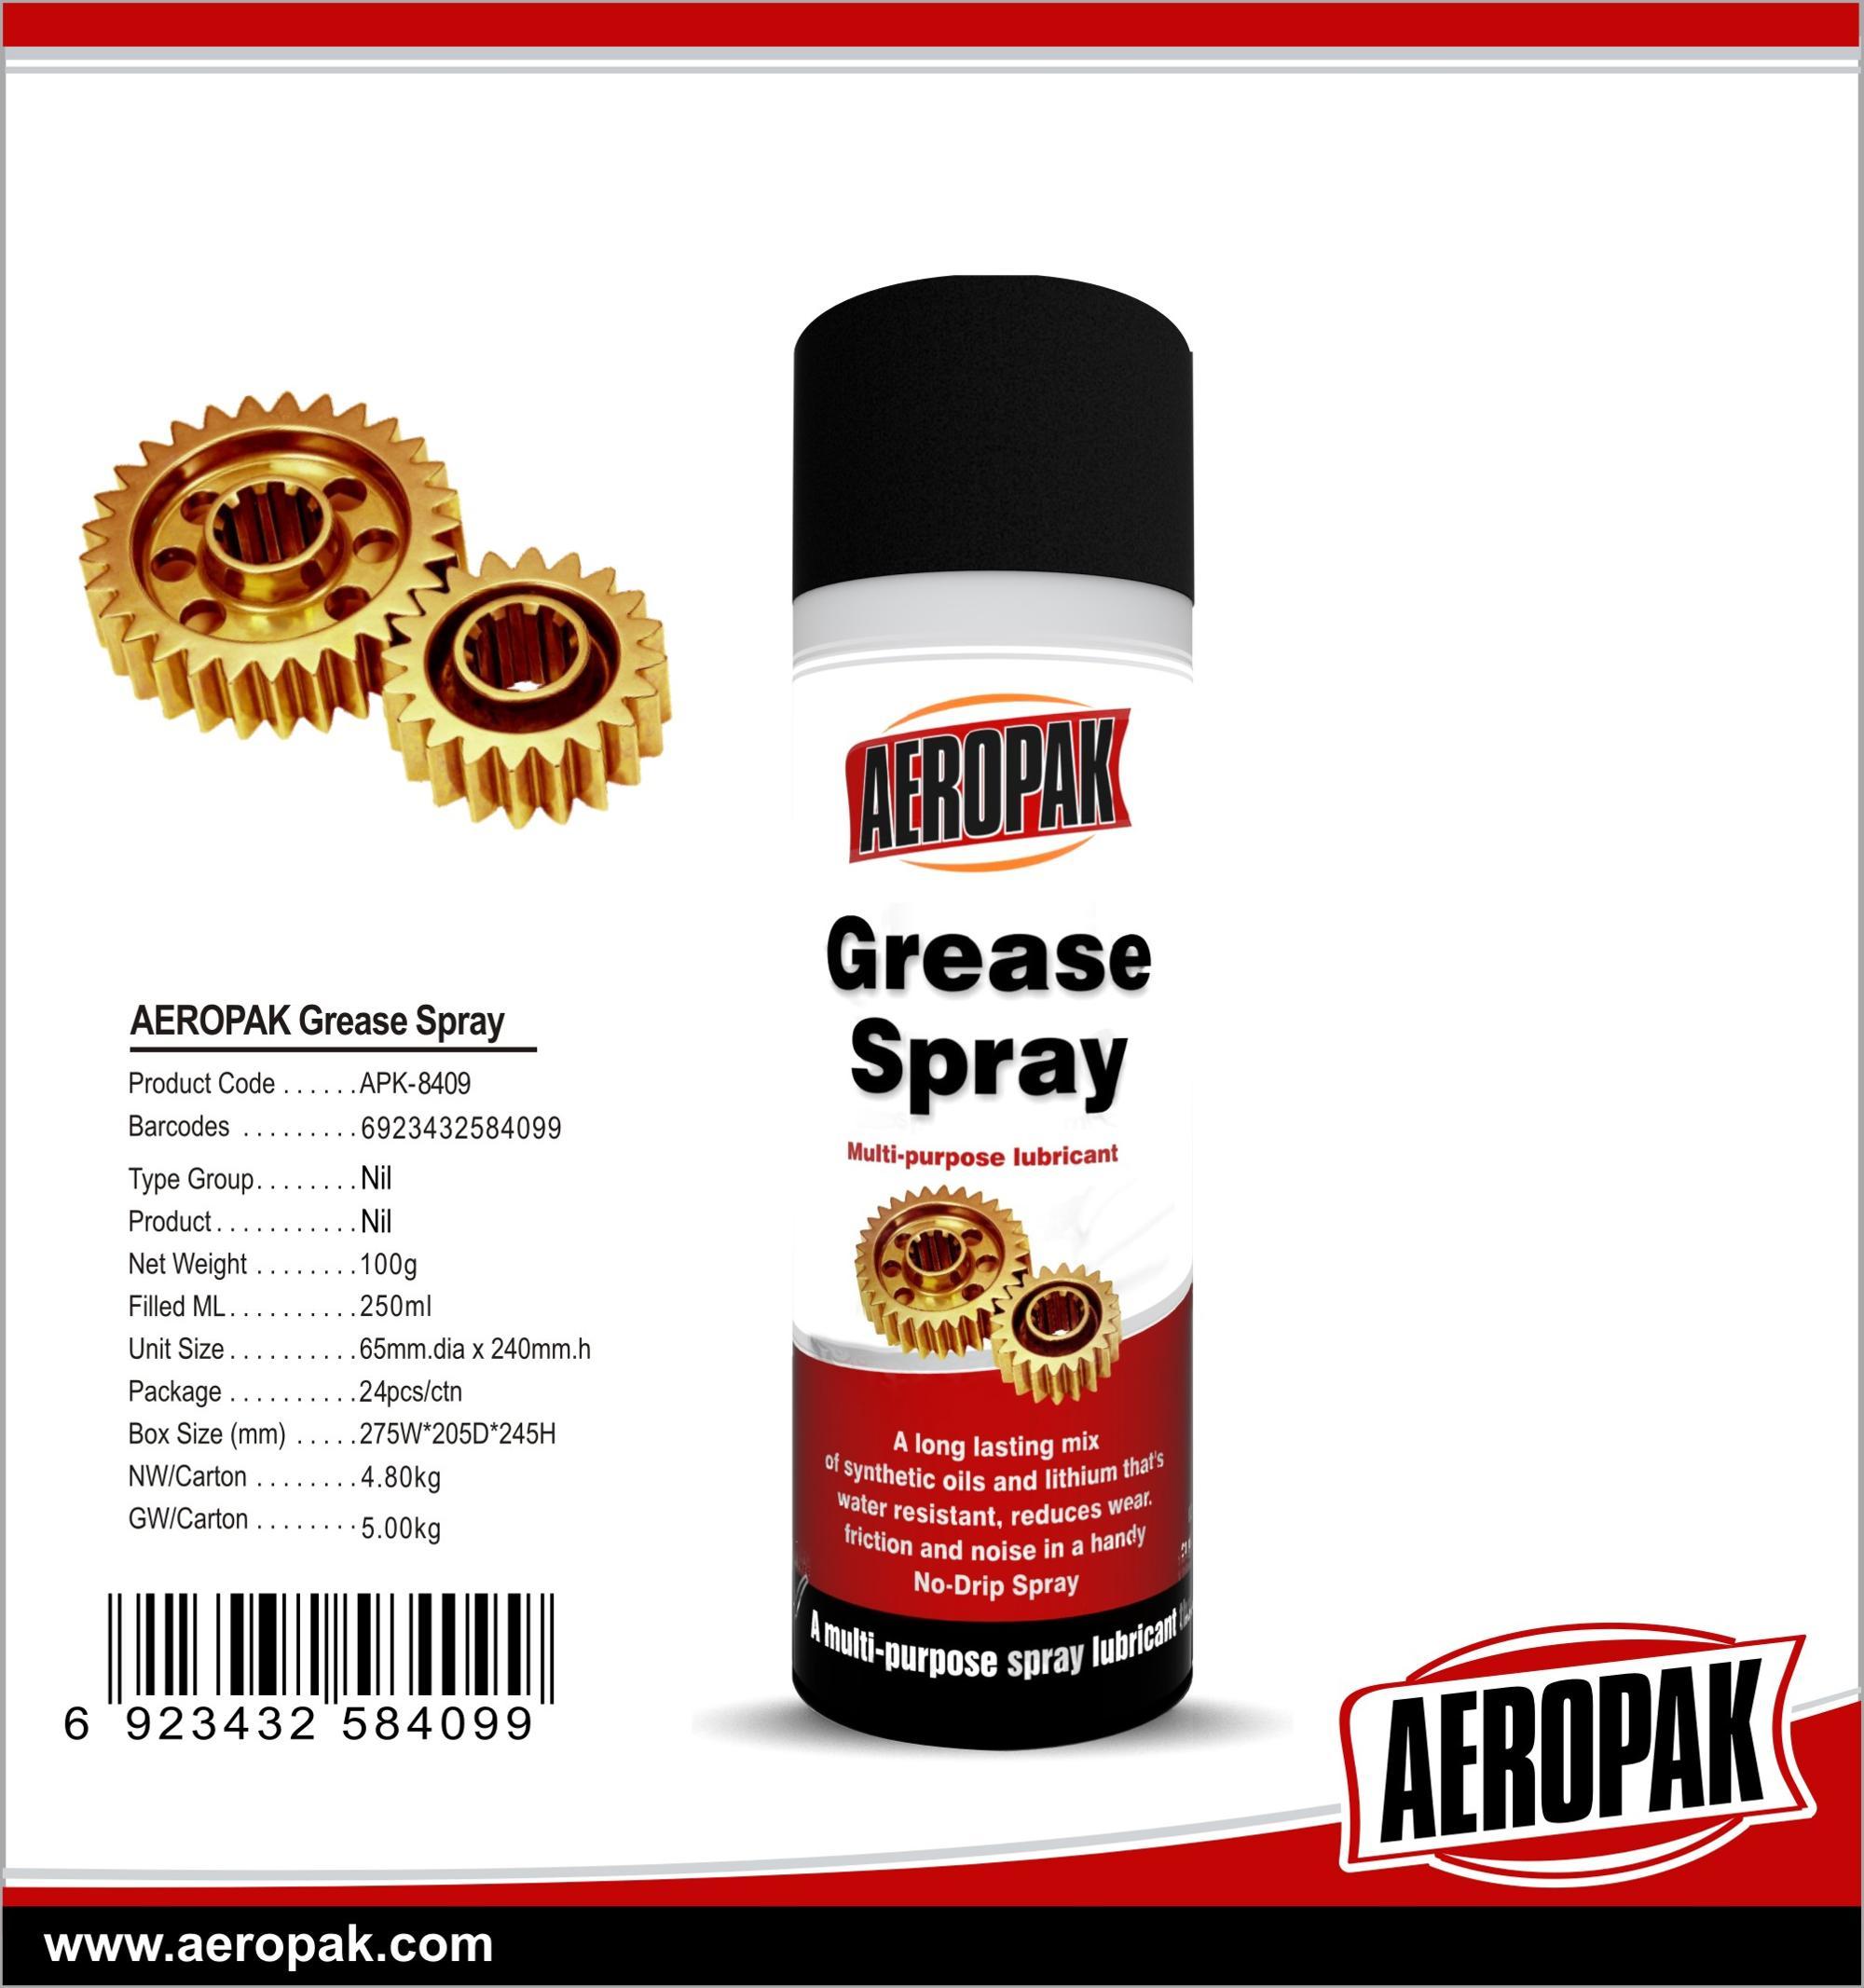 Aeropak Good Quality Grease Spray 200ml